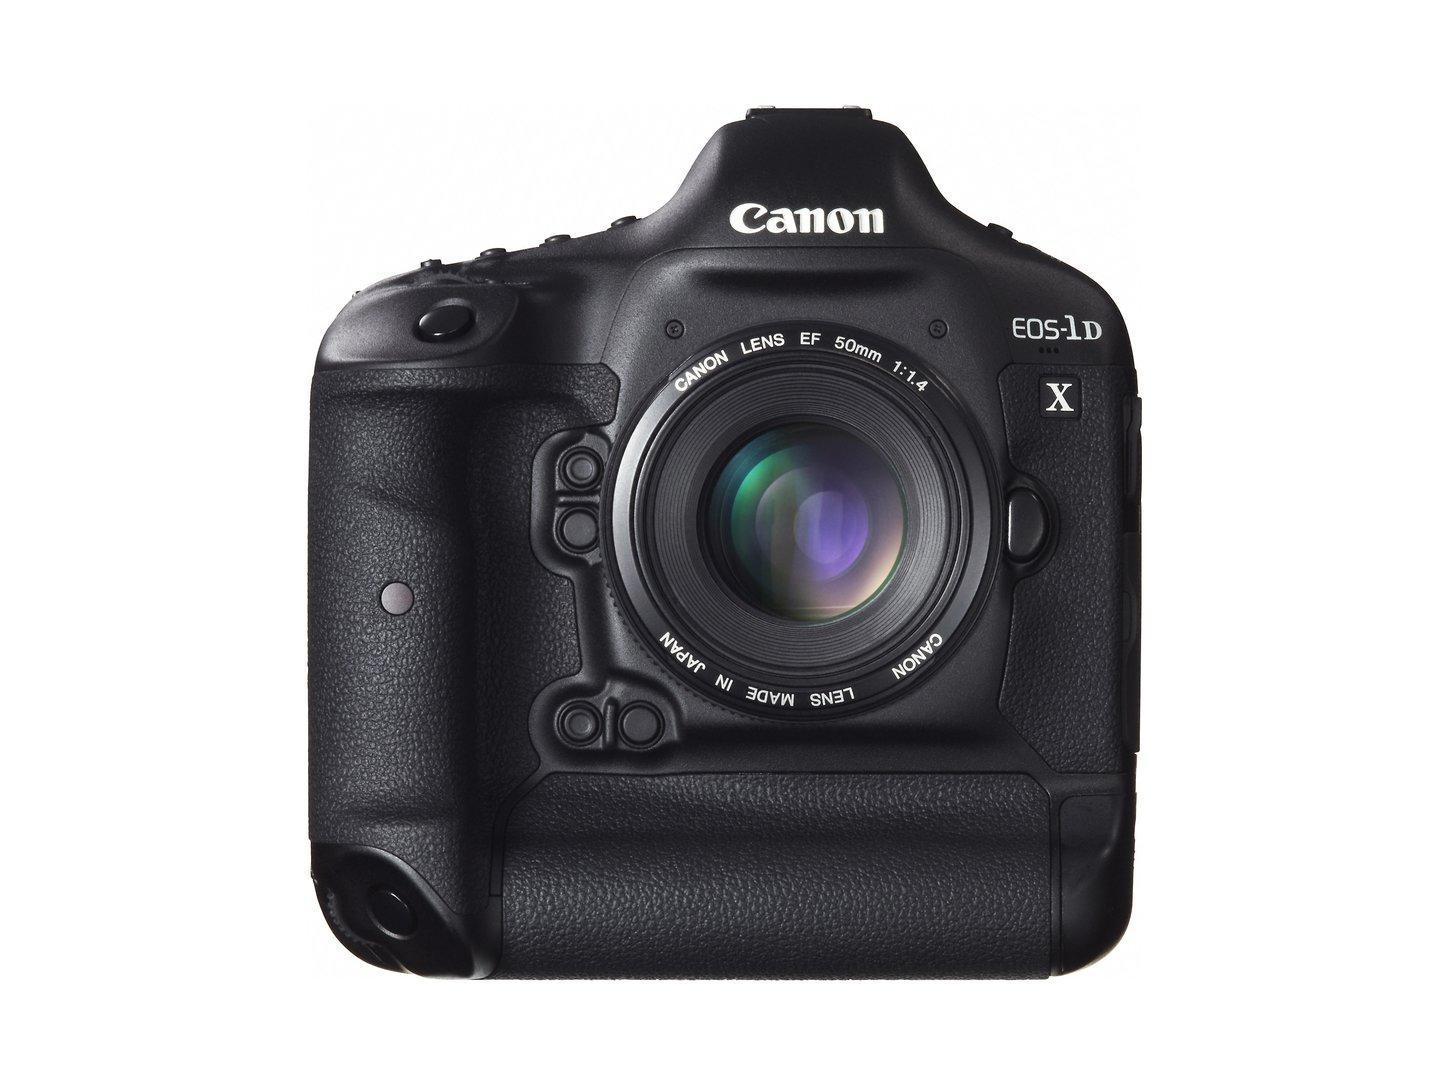 Canon EOS-1D X mit EF 50mm 1:1,4 USM